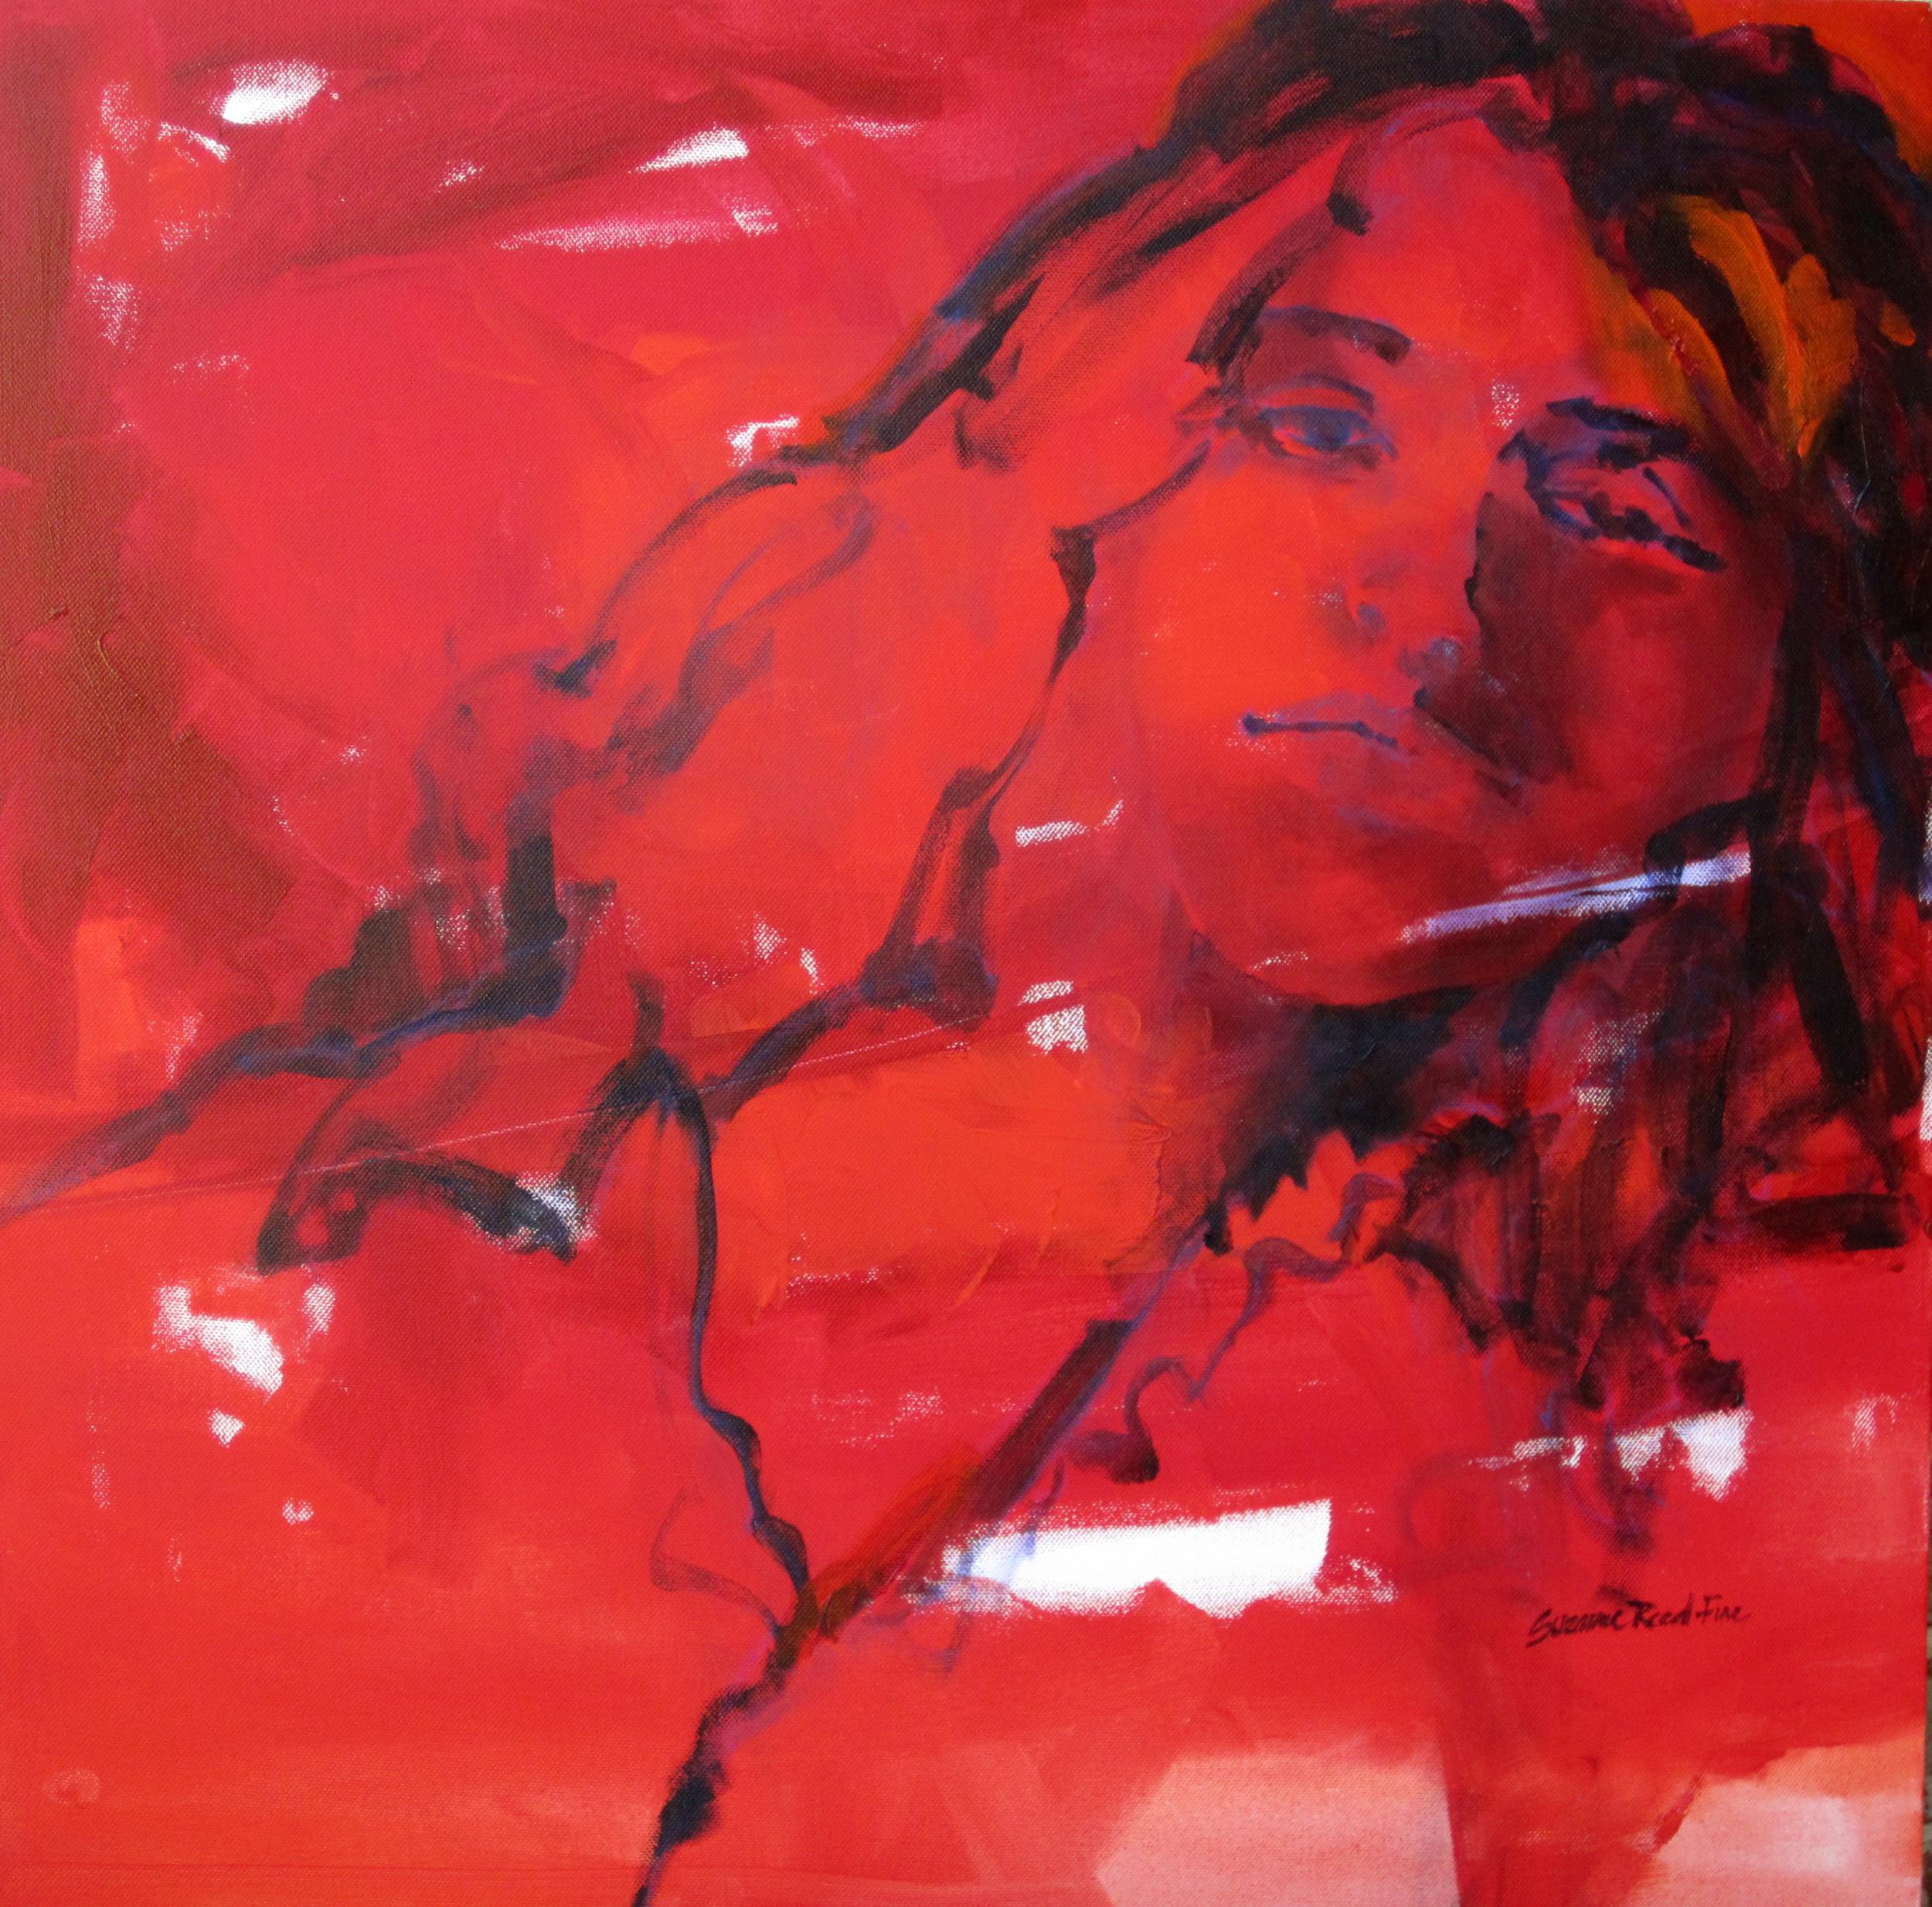 24x24 Acrylic on canvas, Sold